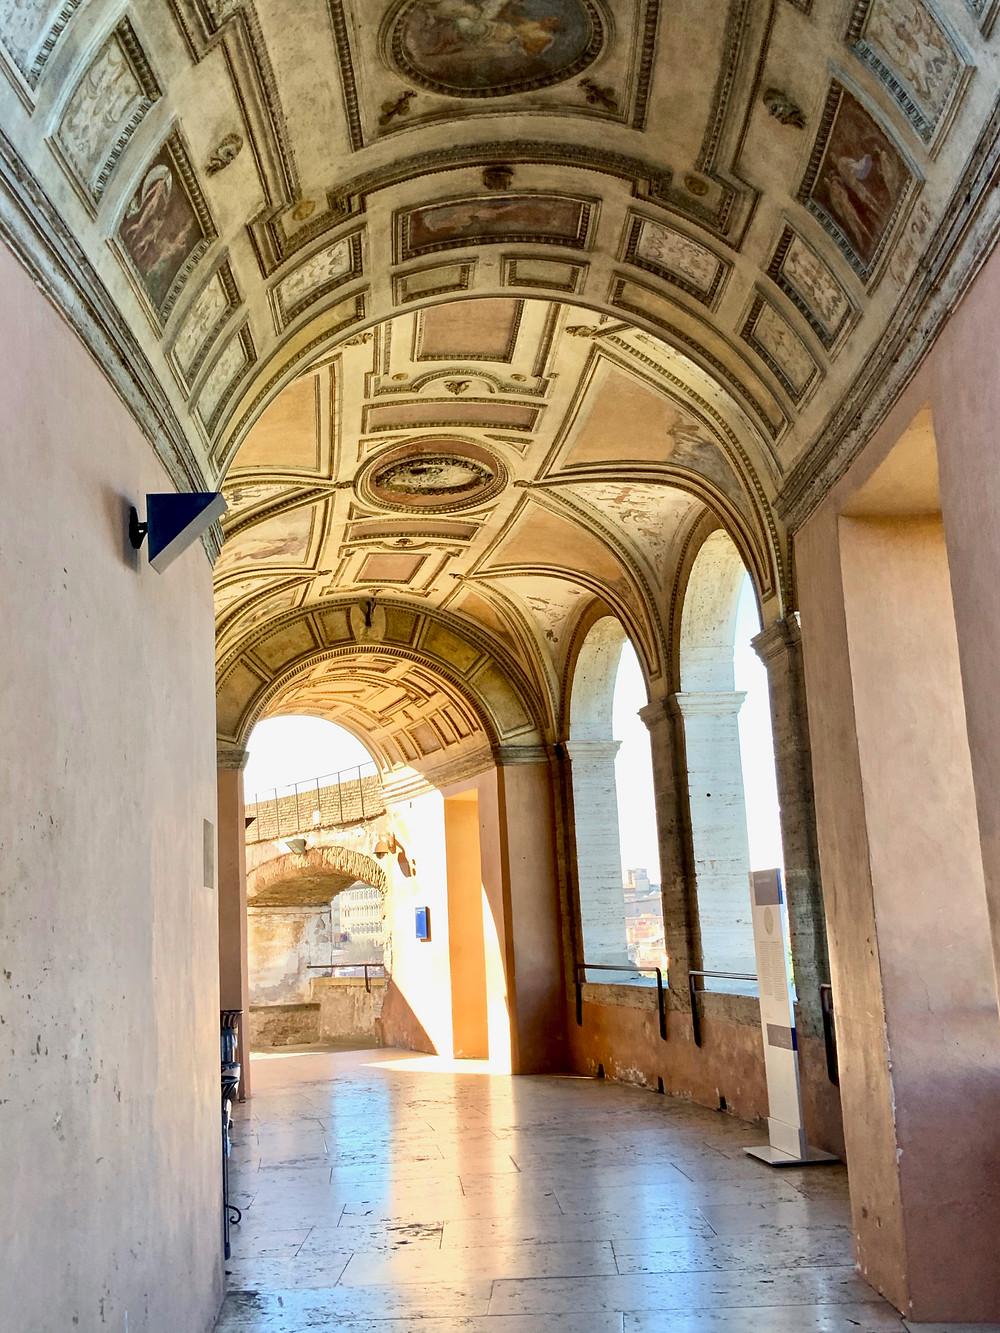 Alexander VII Walkway